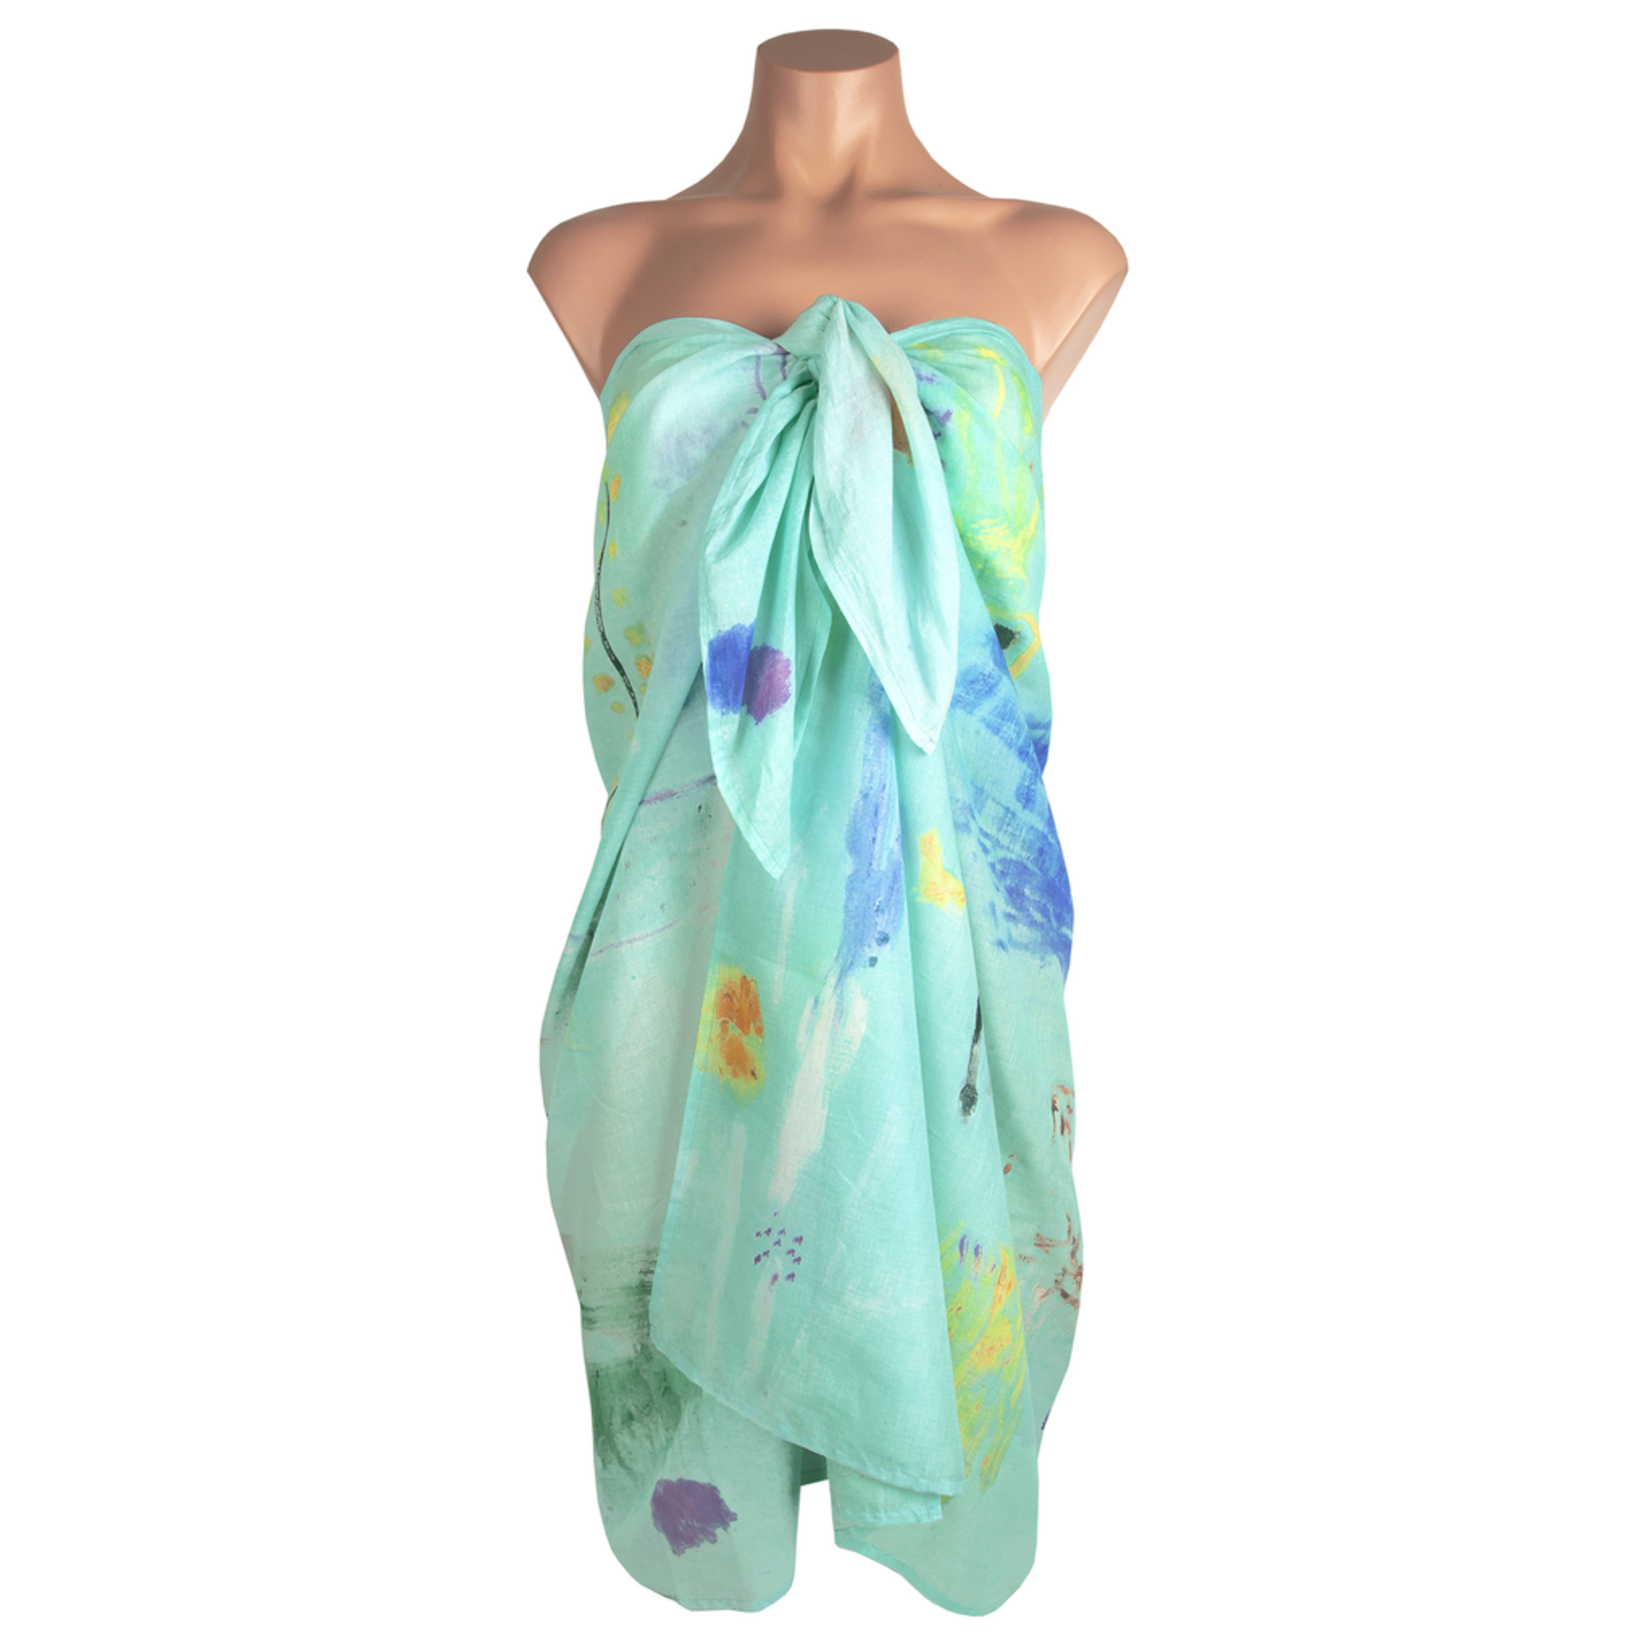 Clothing Pareo - See 3